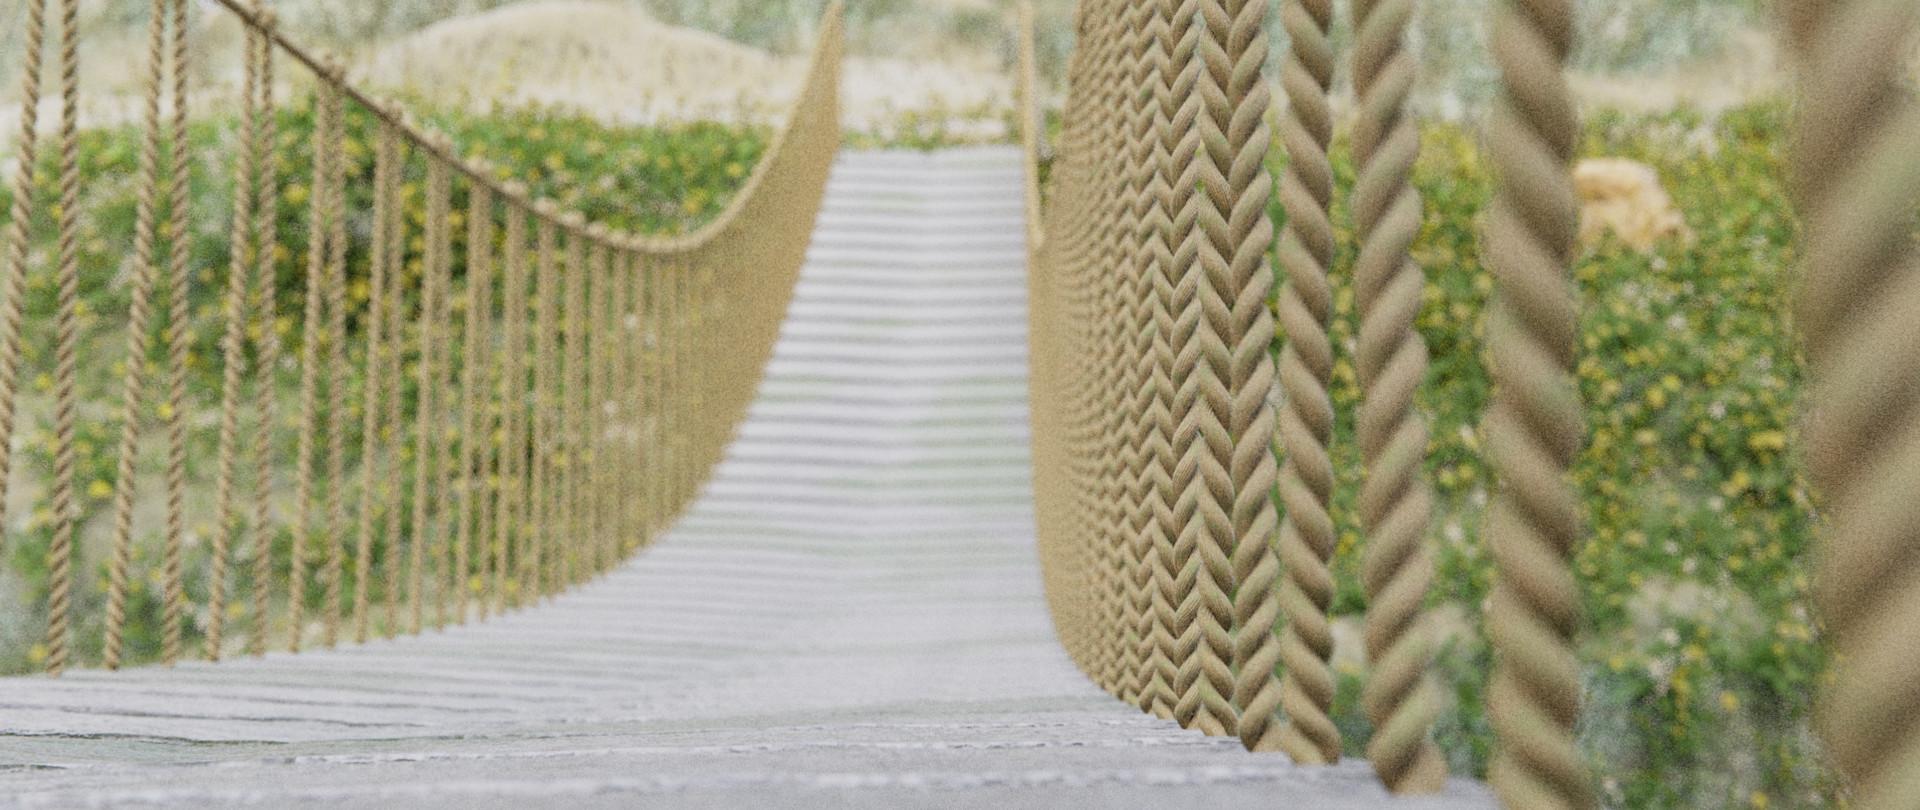 Lennart demes bridge rope detail 0050